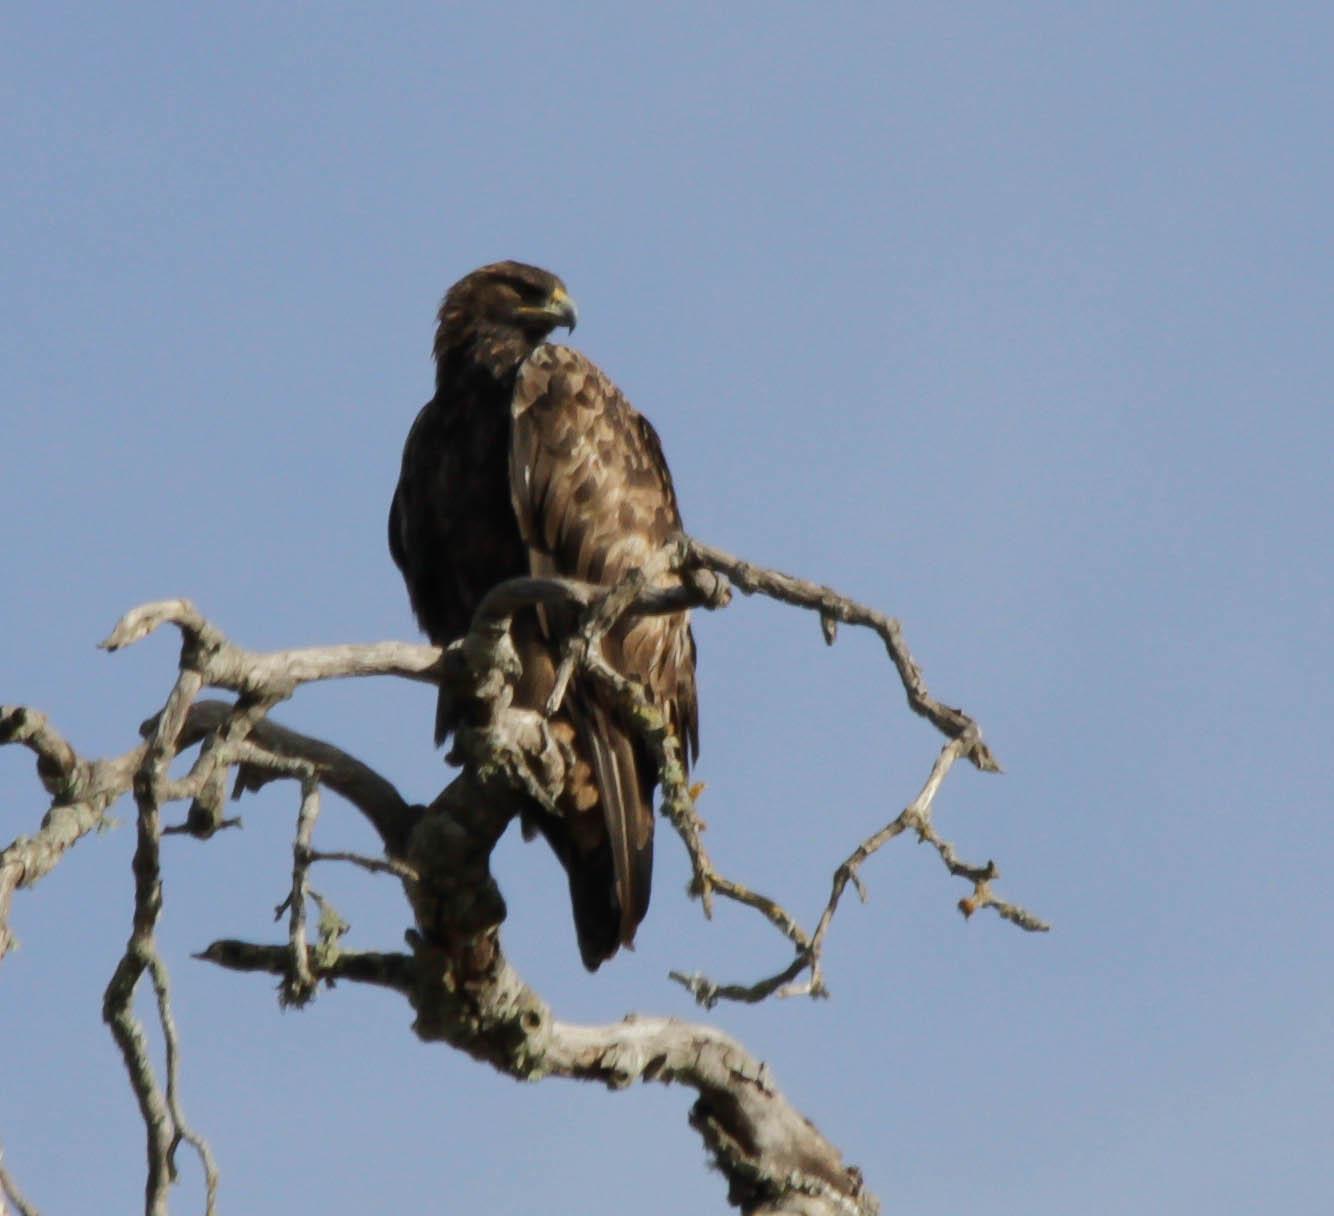 Description golden eagle at rest